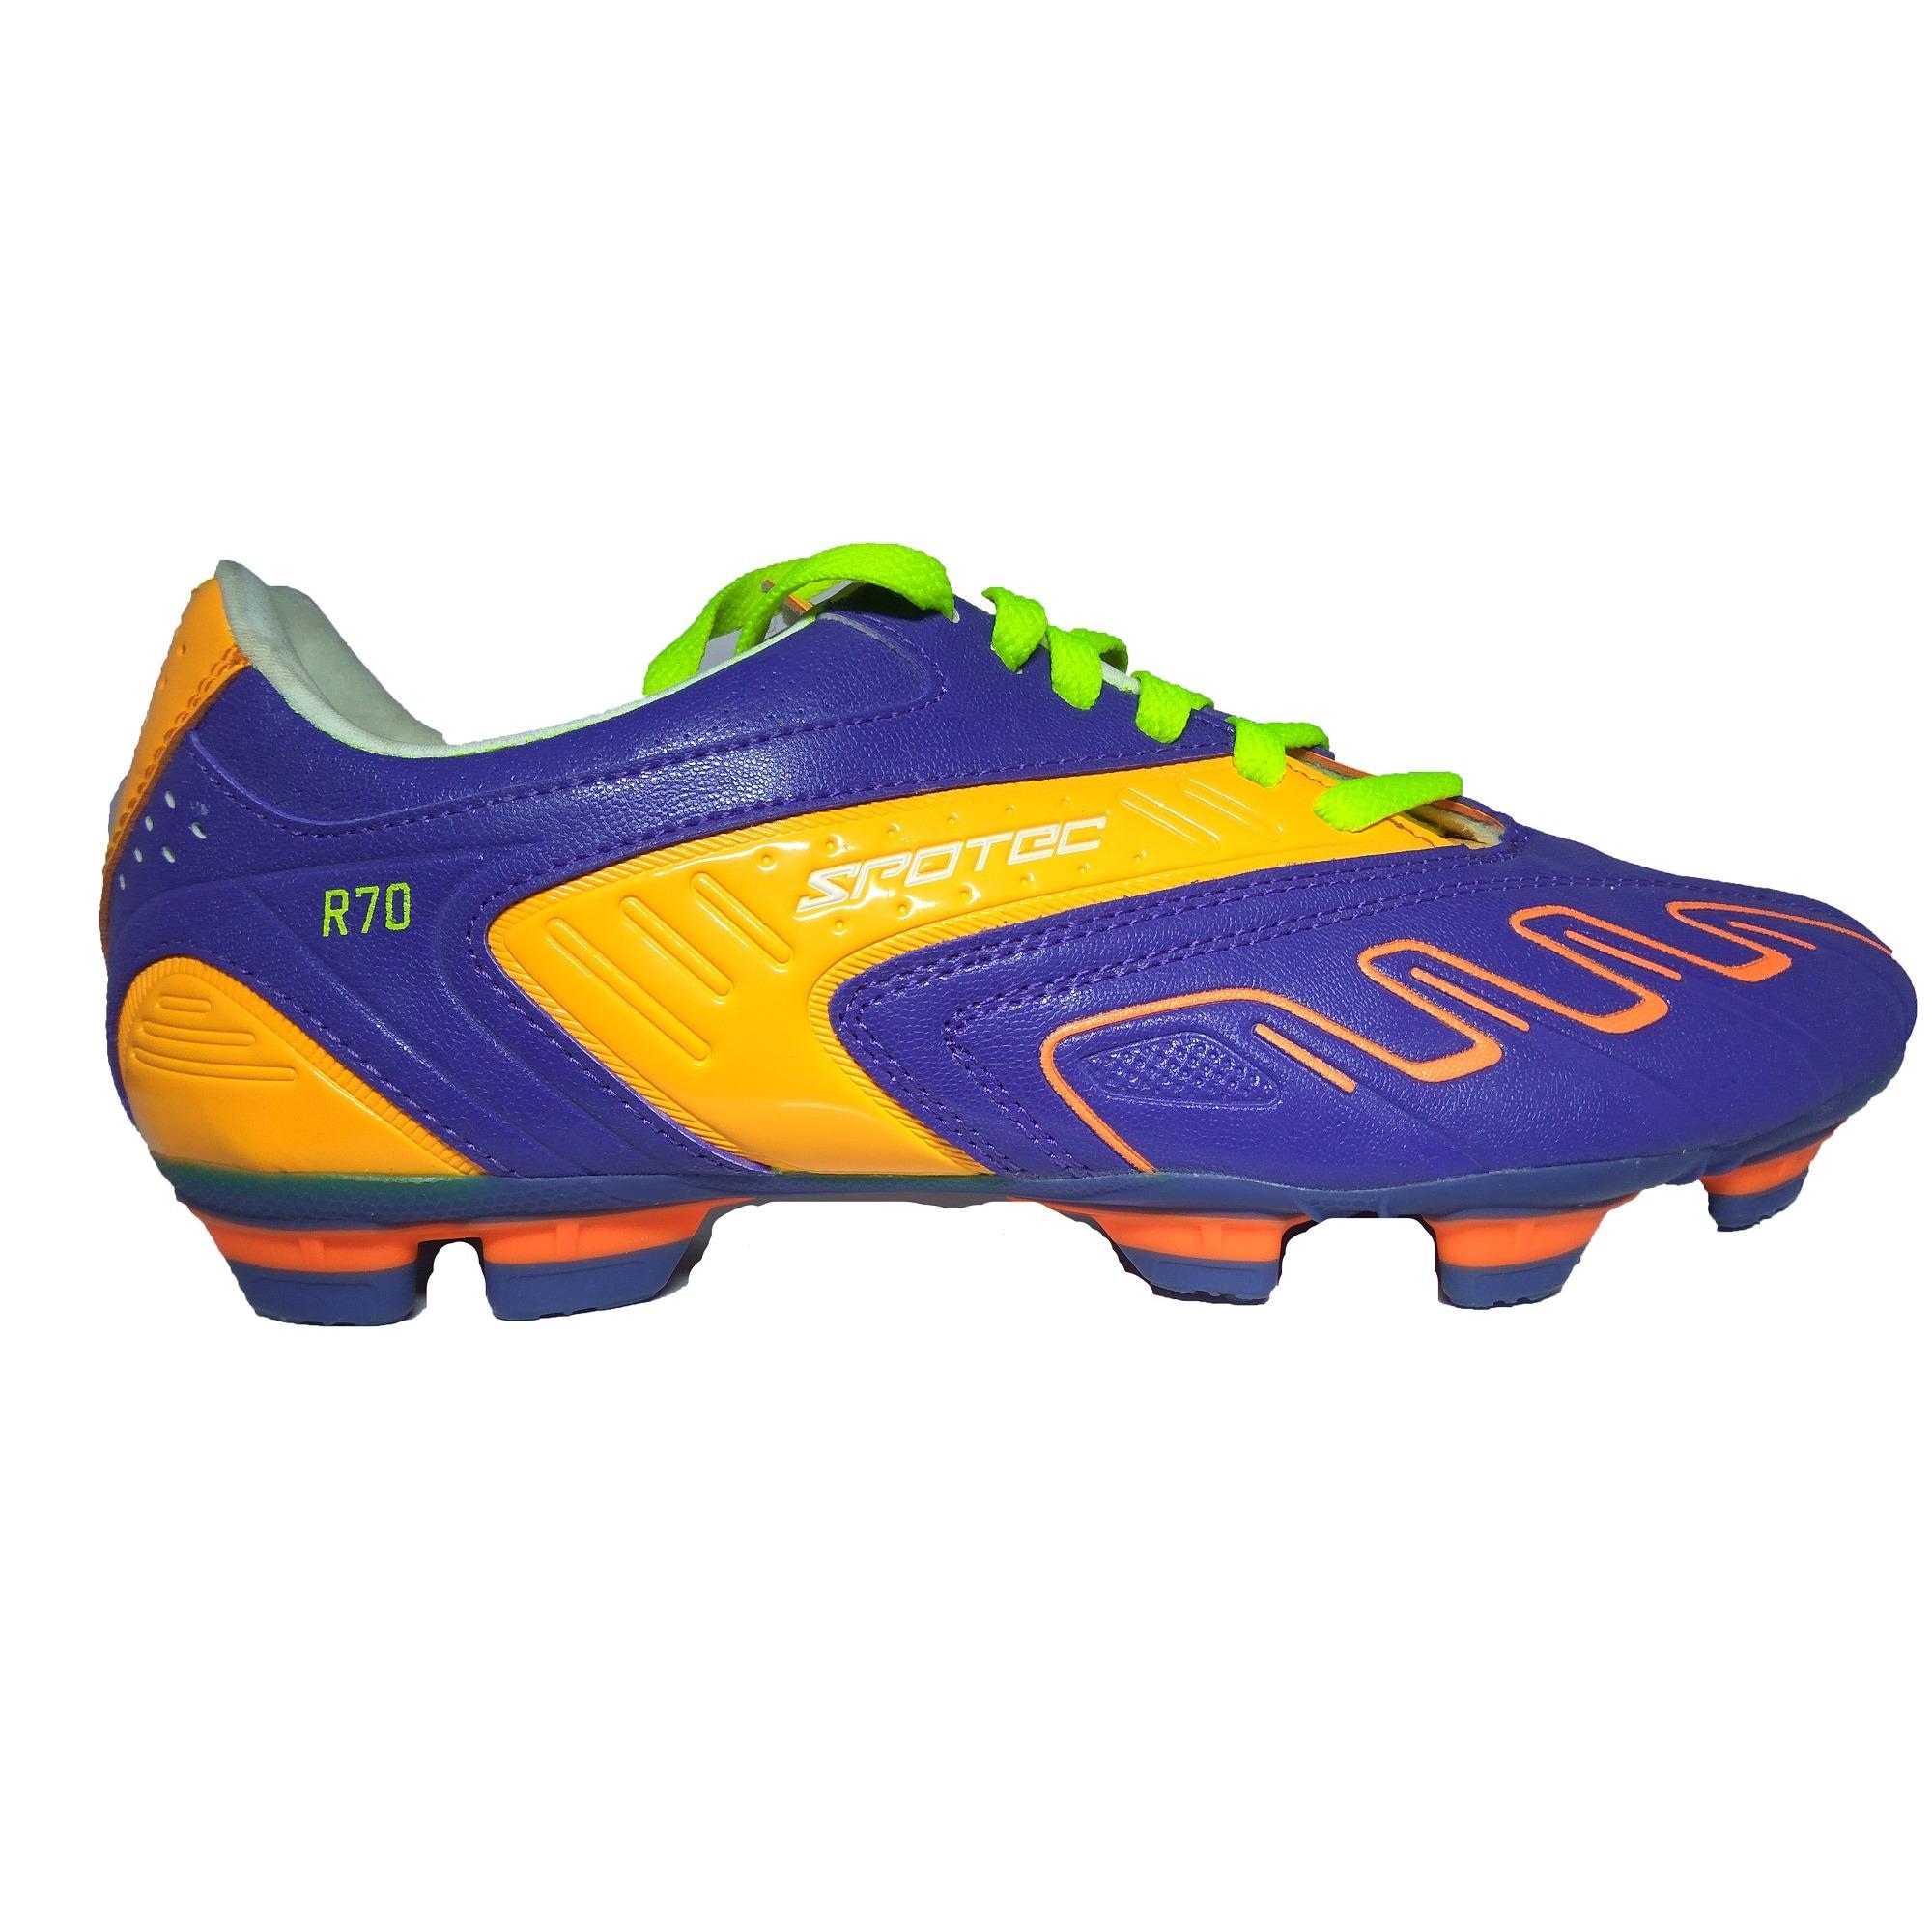 Original Buatan Spotec Sepatu Spotec R70 Soccer - Sepatu Sepakbola Anak -  Sepatu Pria - Sepatu Sepakbola - Sepatu 826cd40fa7